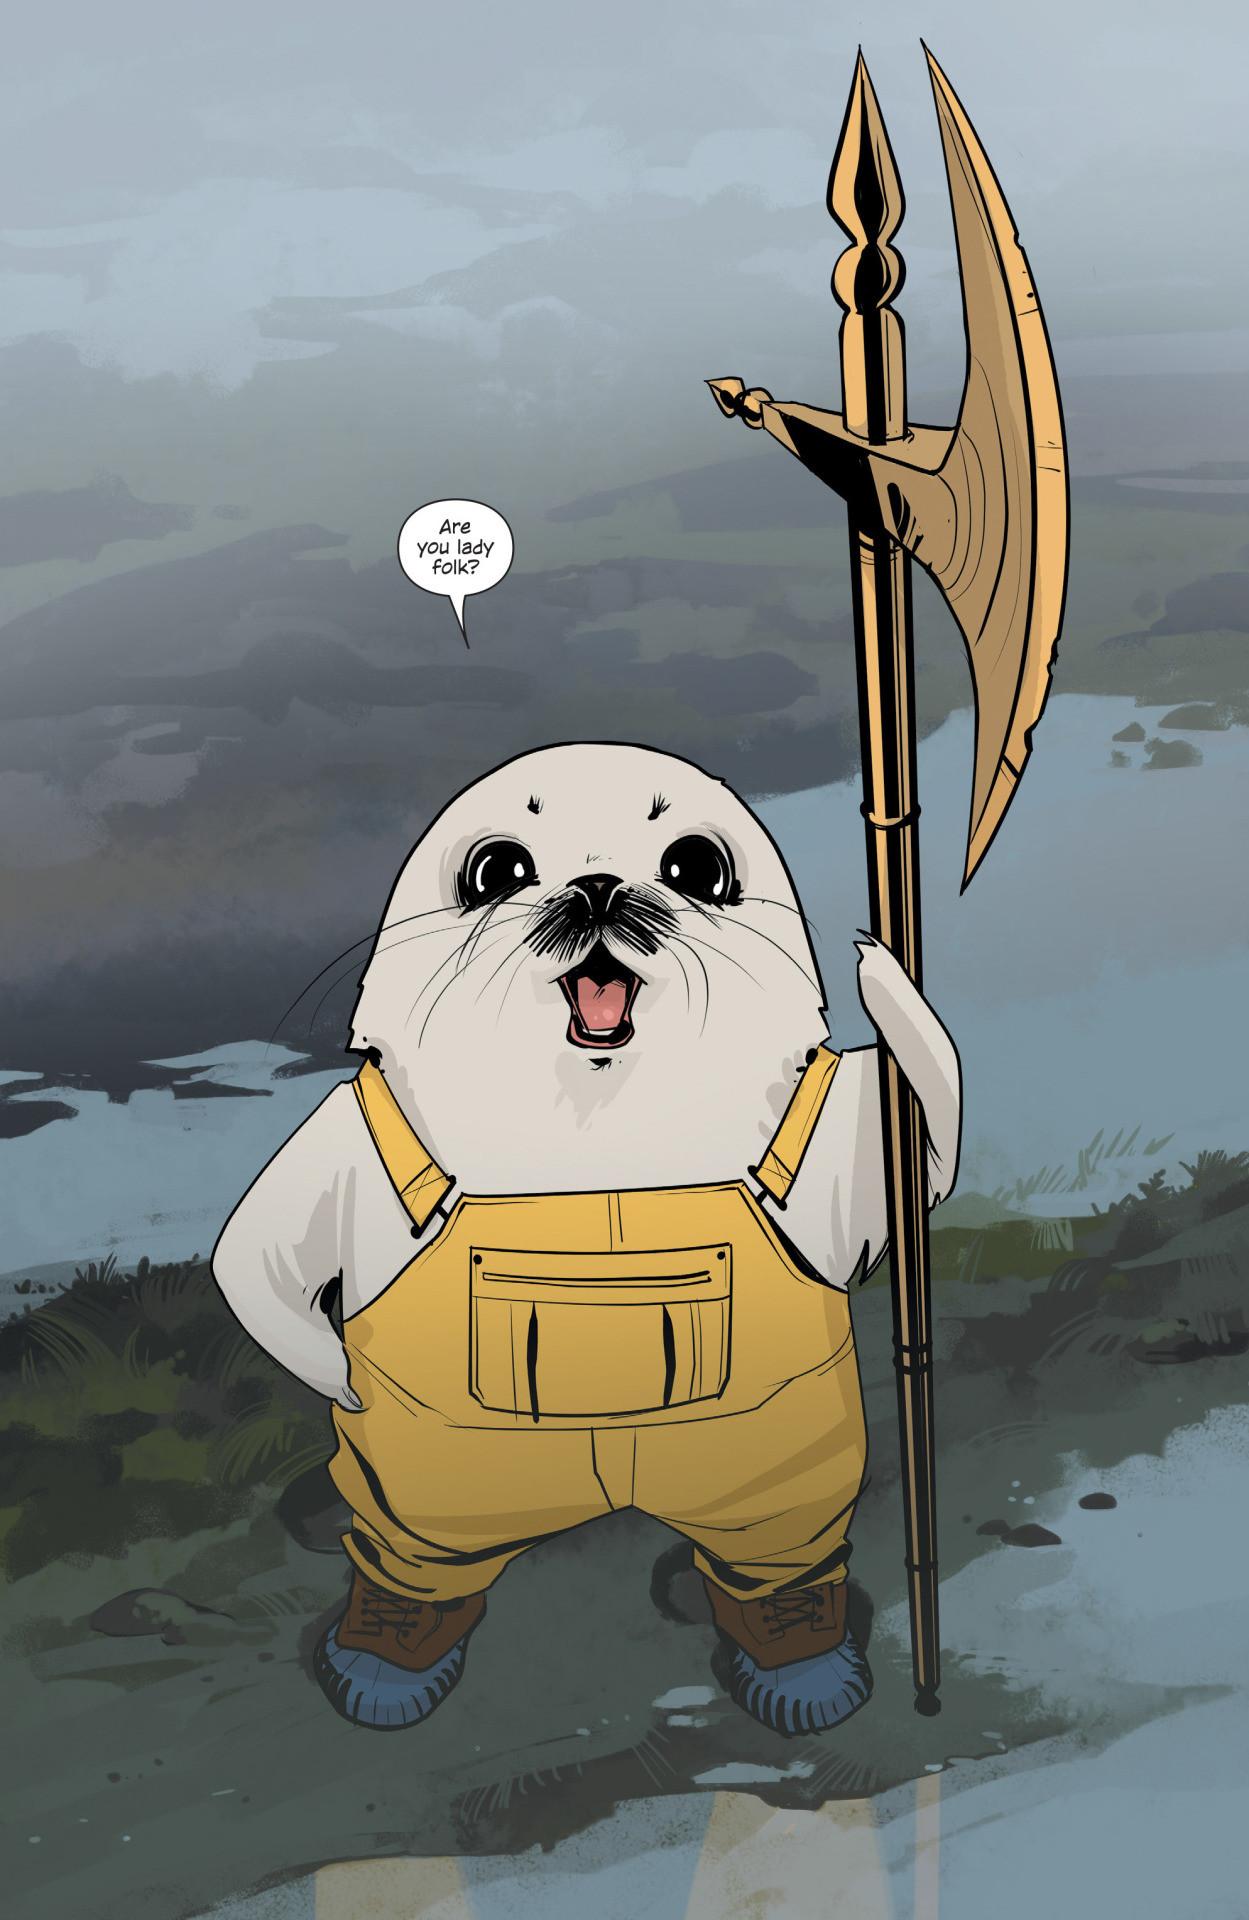 Saga brian vaughan comic online image comics fiona staples  biggisdickis.tumblr.com